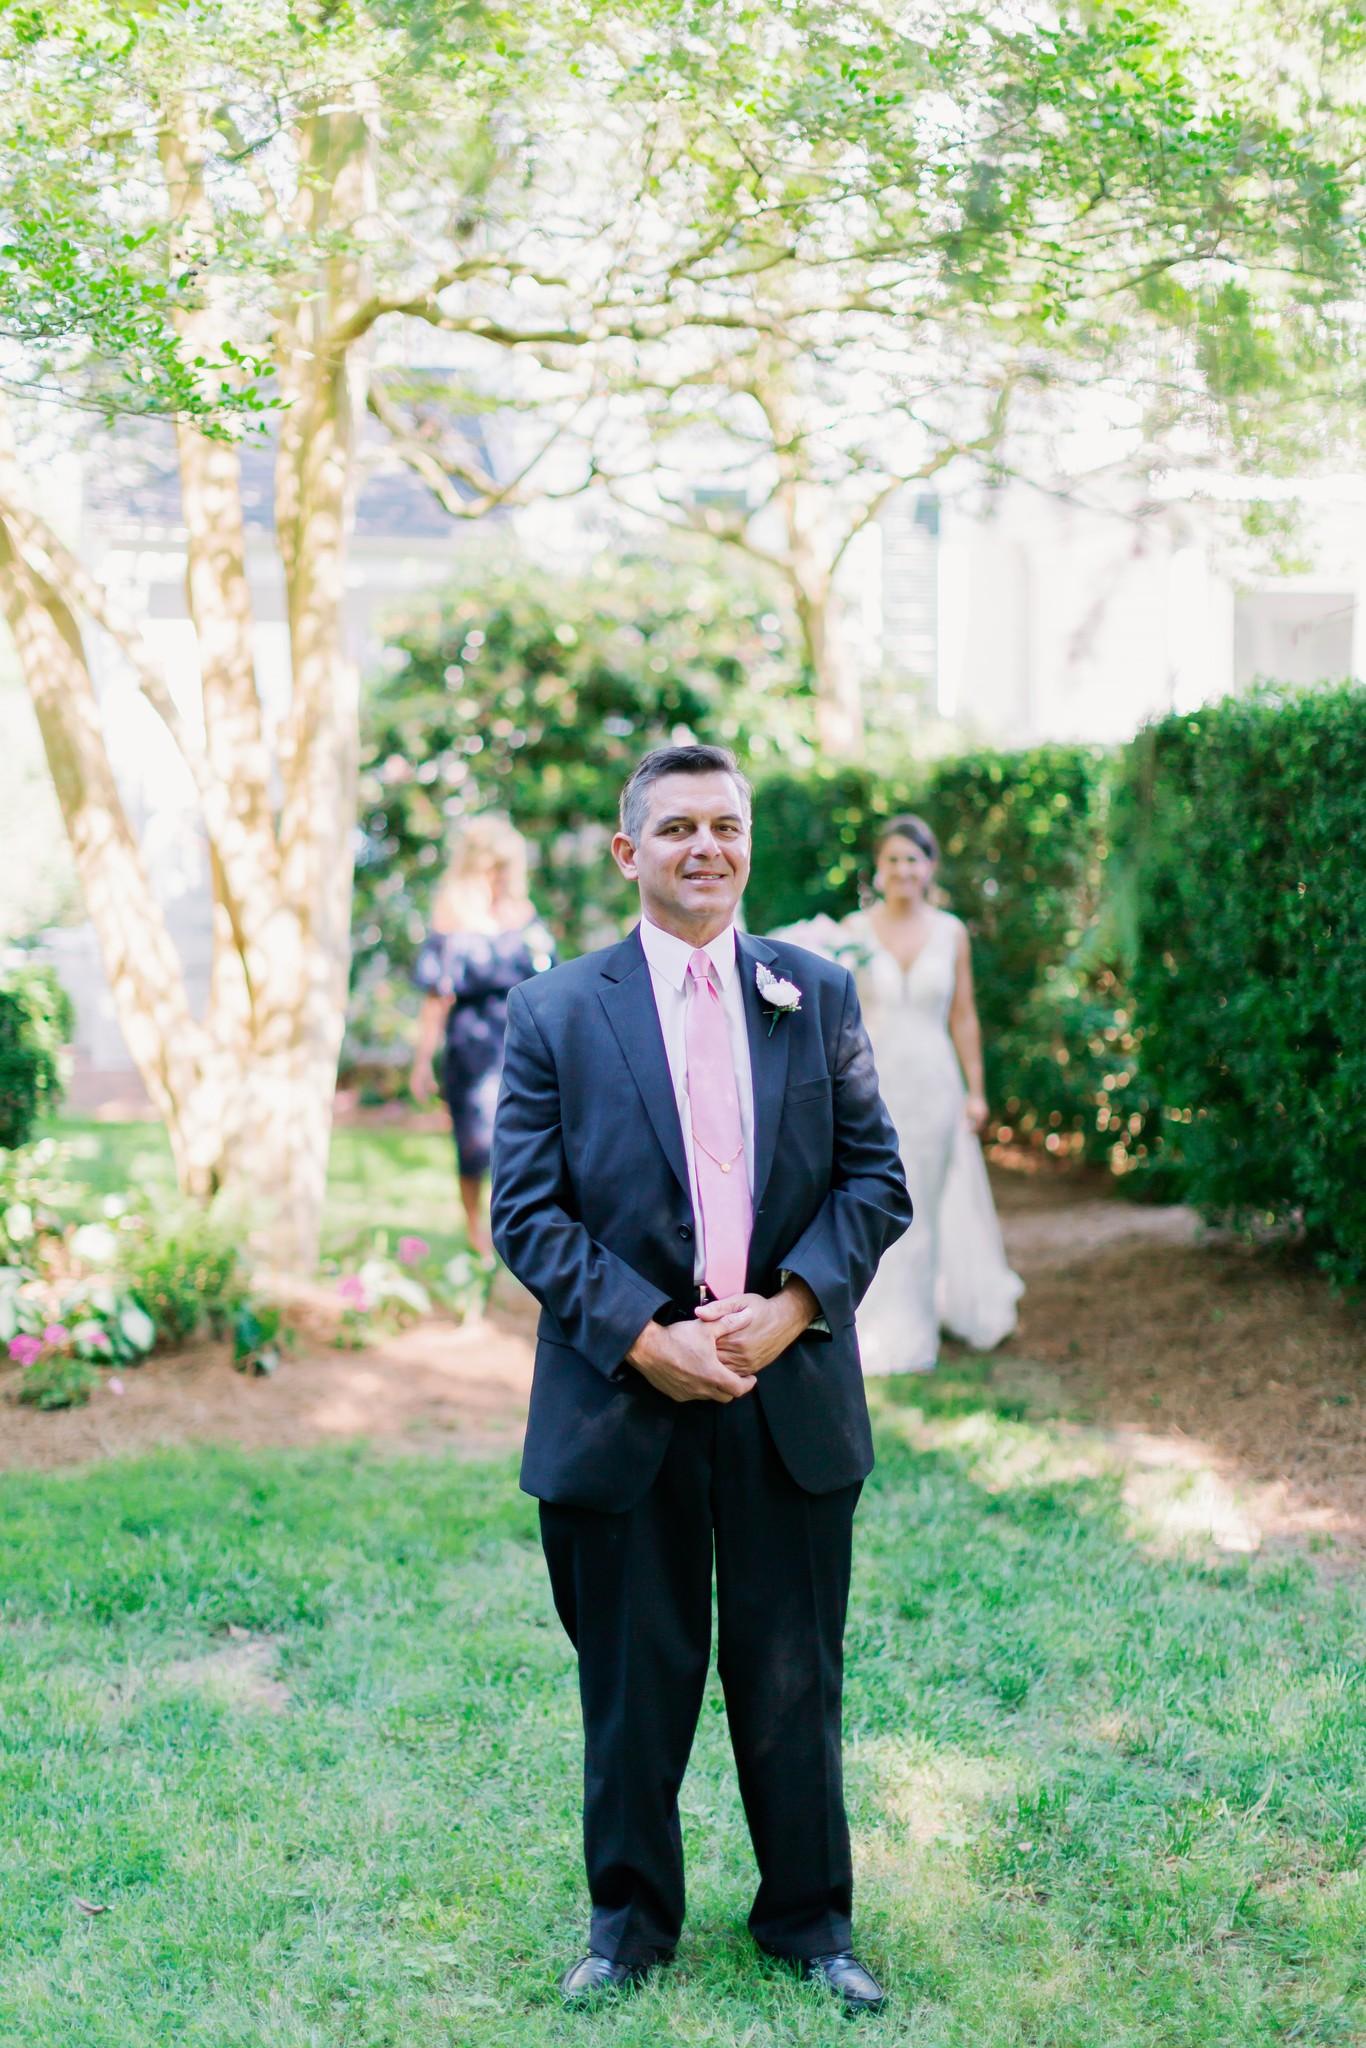 Cape-Charles- Wedding- Erik-Haven-2019 (96).jpg